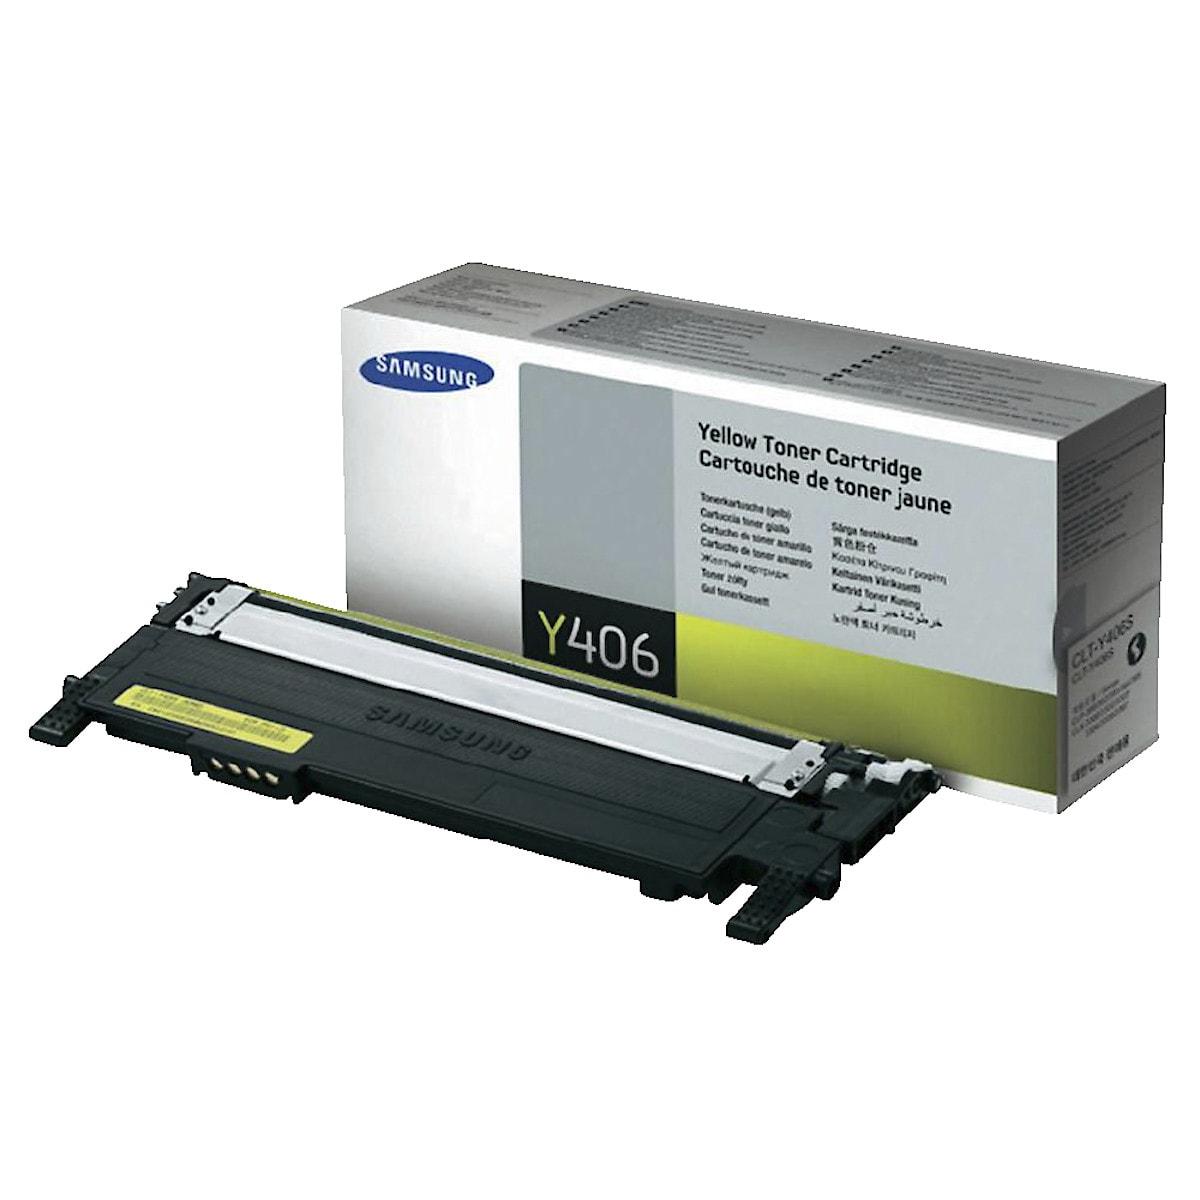 Samsung CLT-406 Toner